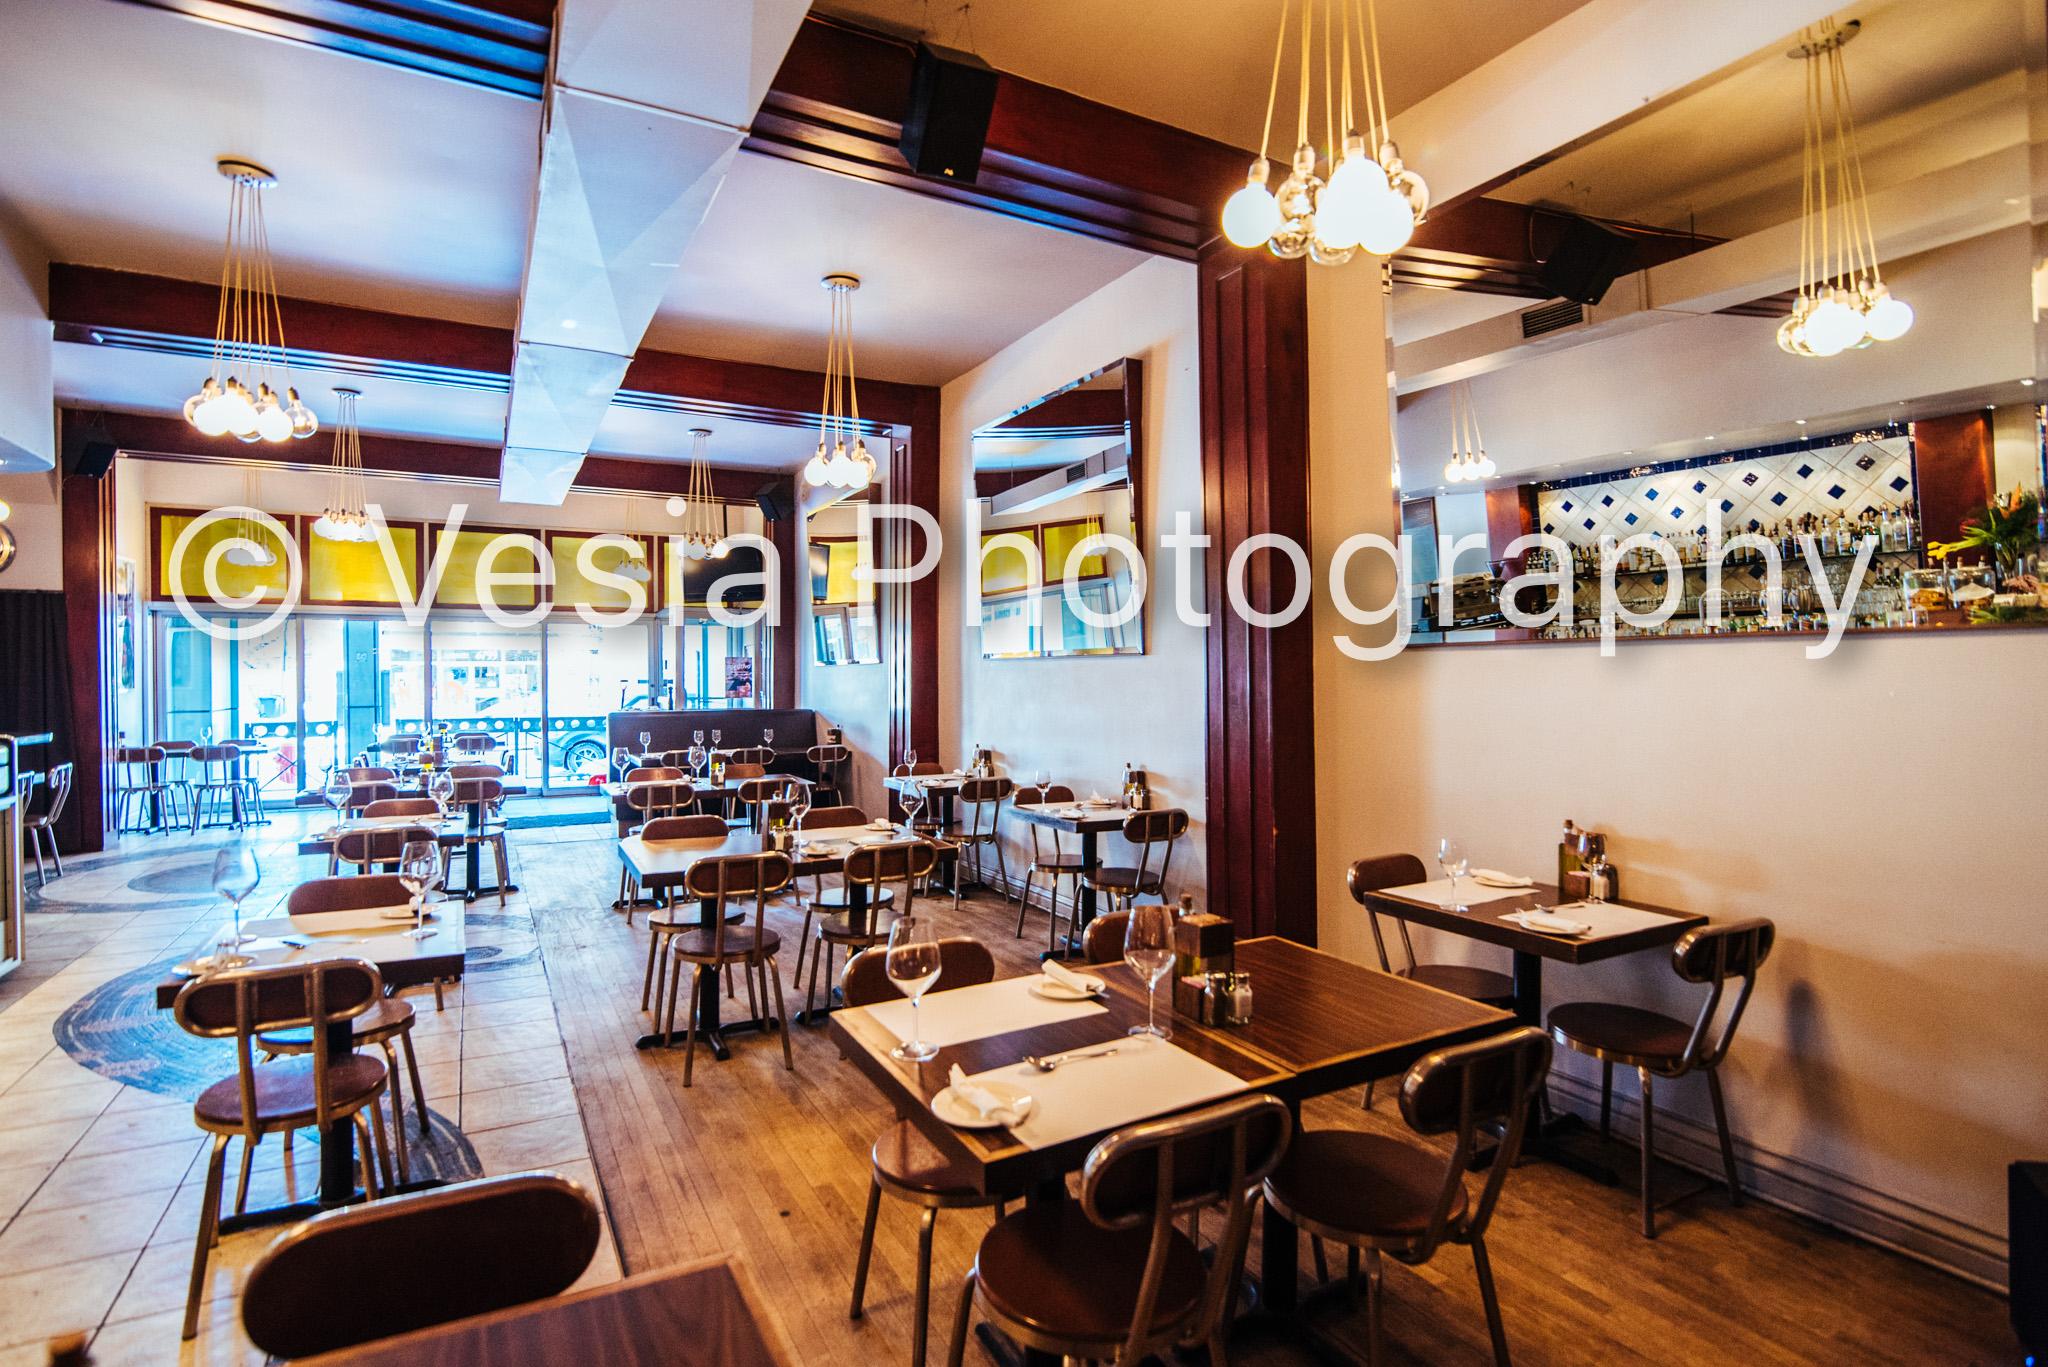 Cafe_Epoca_Proofs-6.jpg